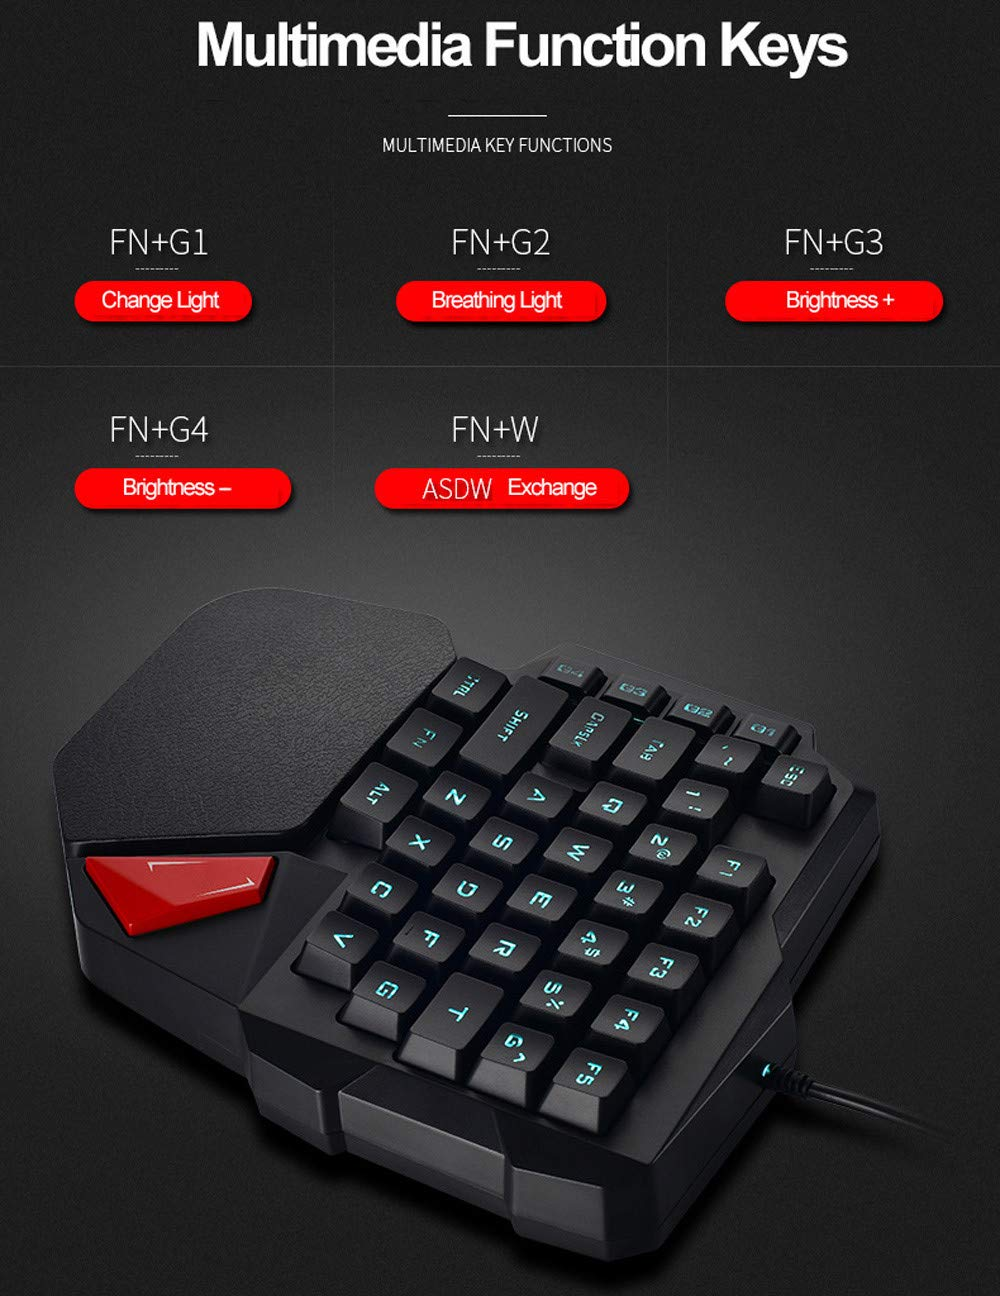 Hisoul One-Handed Gaming Keyboard, K108 Wired 38 Keys LED Backlit USB Ergonomic Gaming Keyboard for PUBG CNF and LOL Gamer (Black) by Hisoul (Image #9)